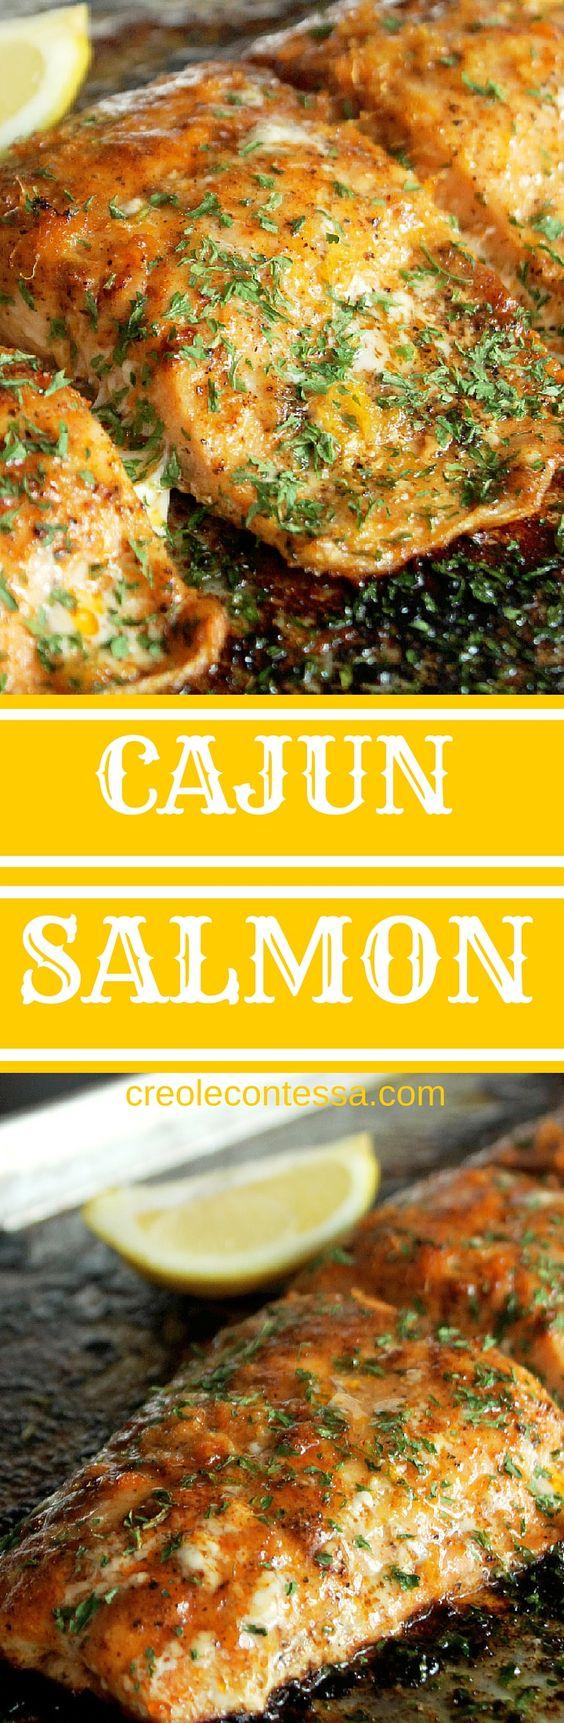 Cajun Salmon-Creole Contessa http://samscutlerydepot.com/product/15-piece-crimson-knife-set-includes-free-roll-bag-and-7-edge-guards/